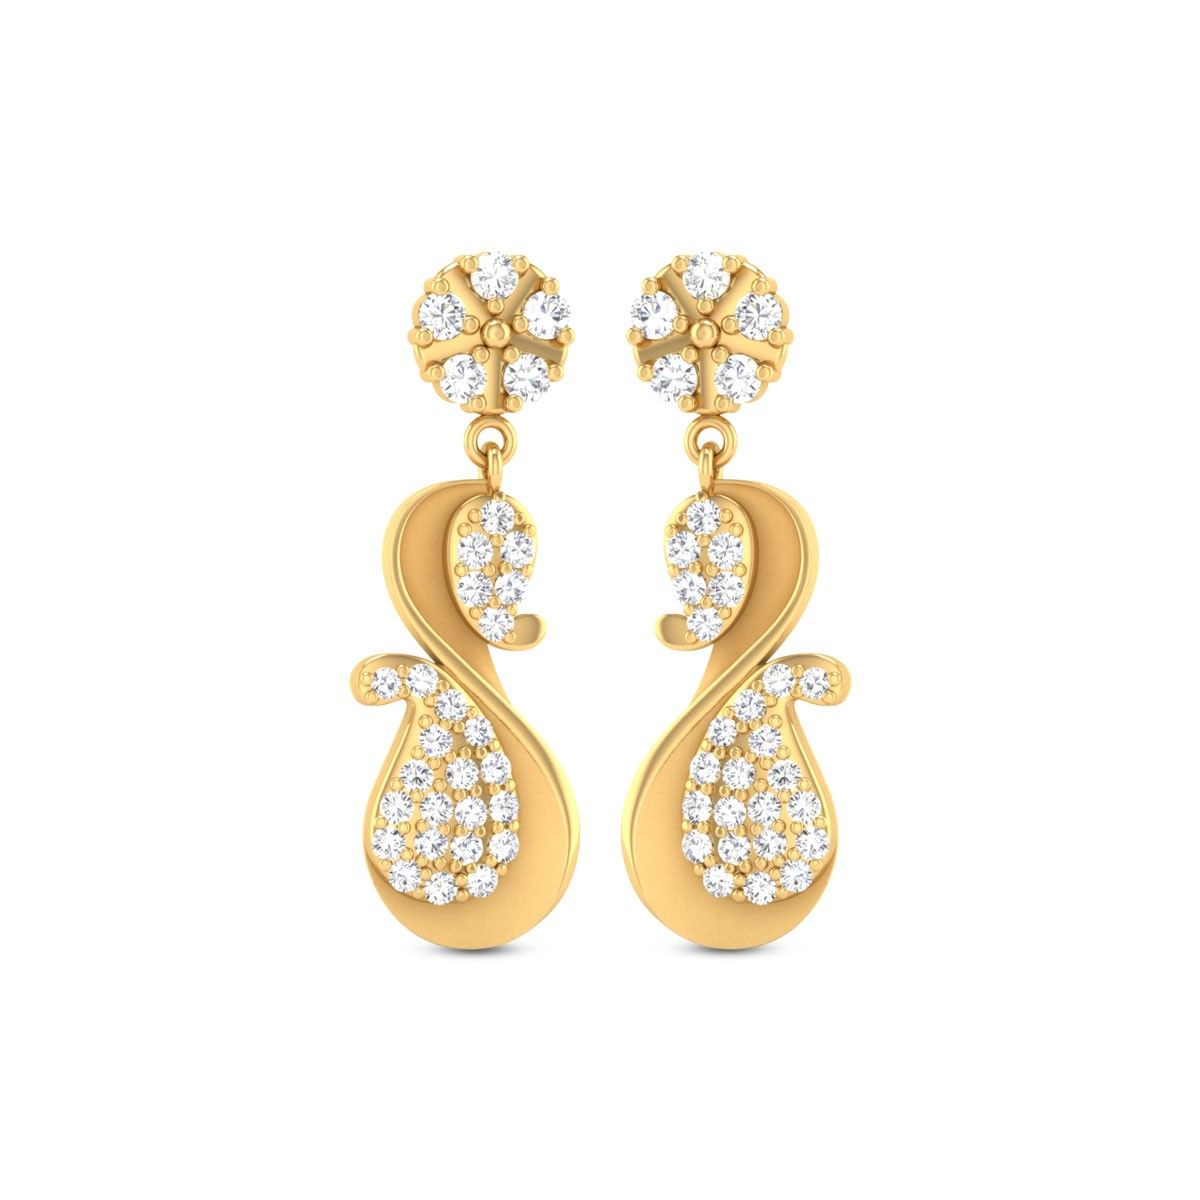 Cate Gold Earrings